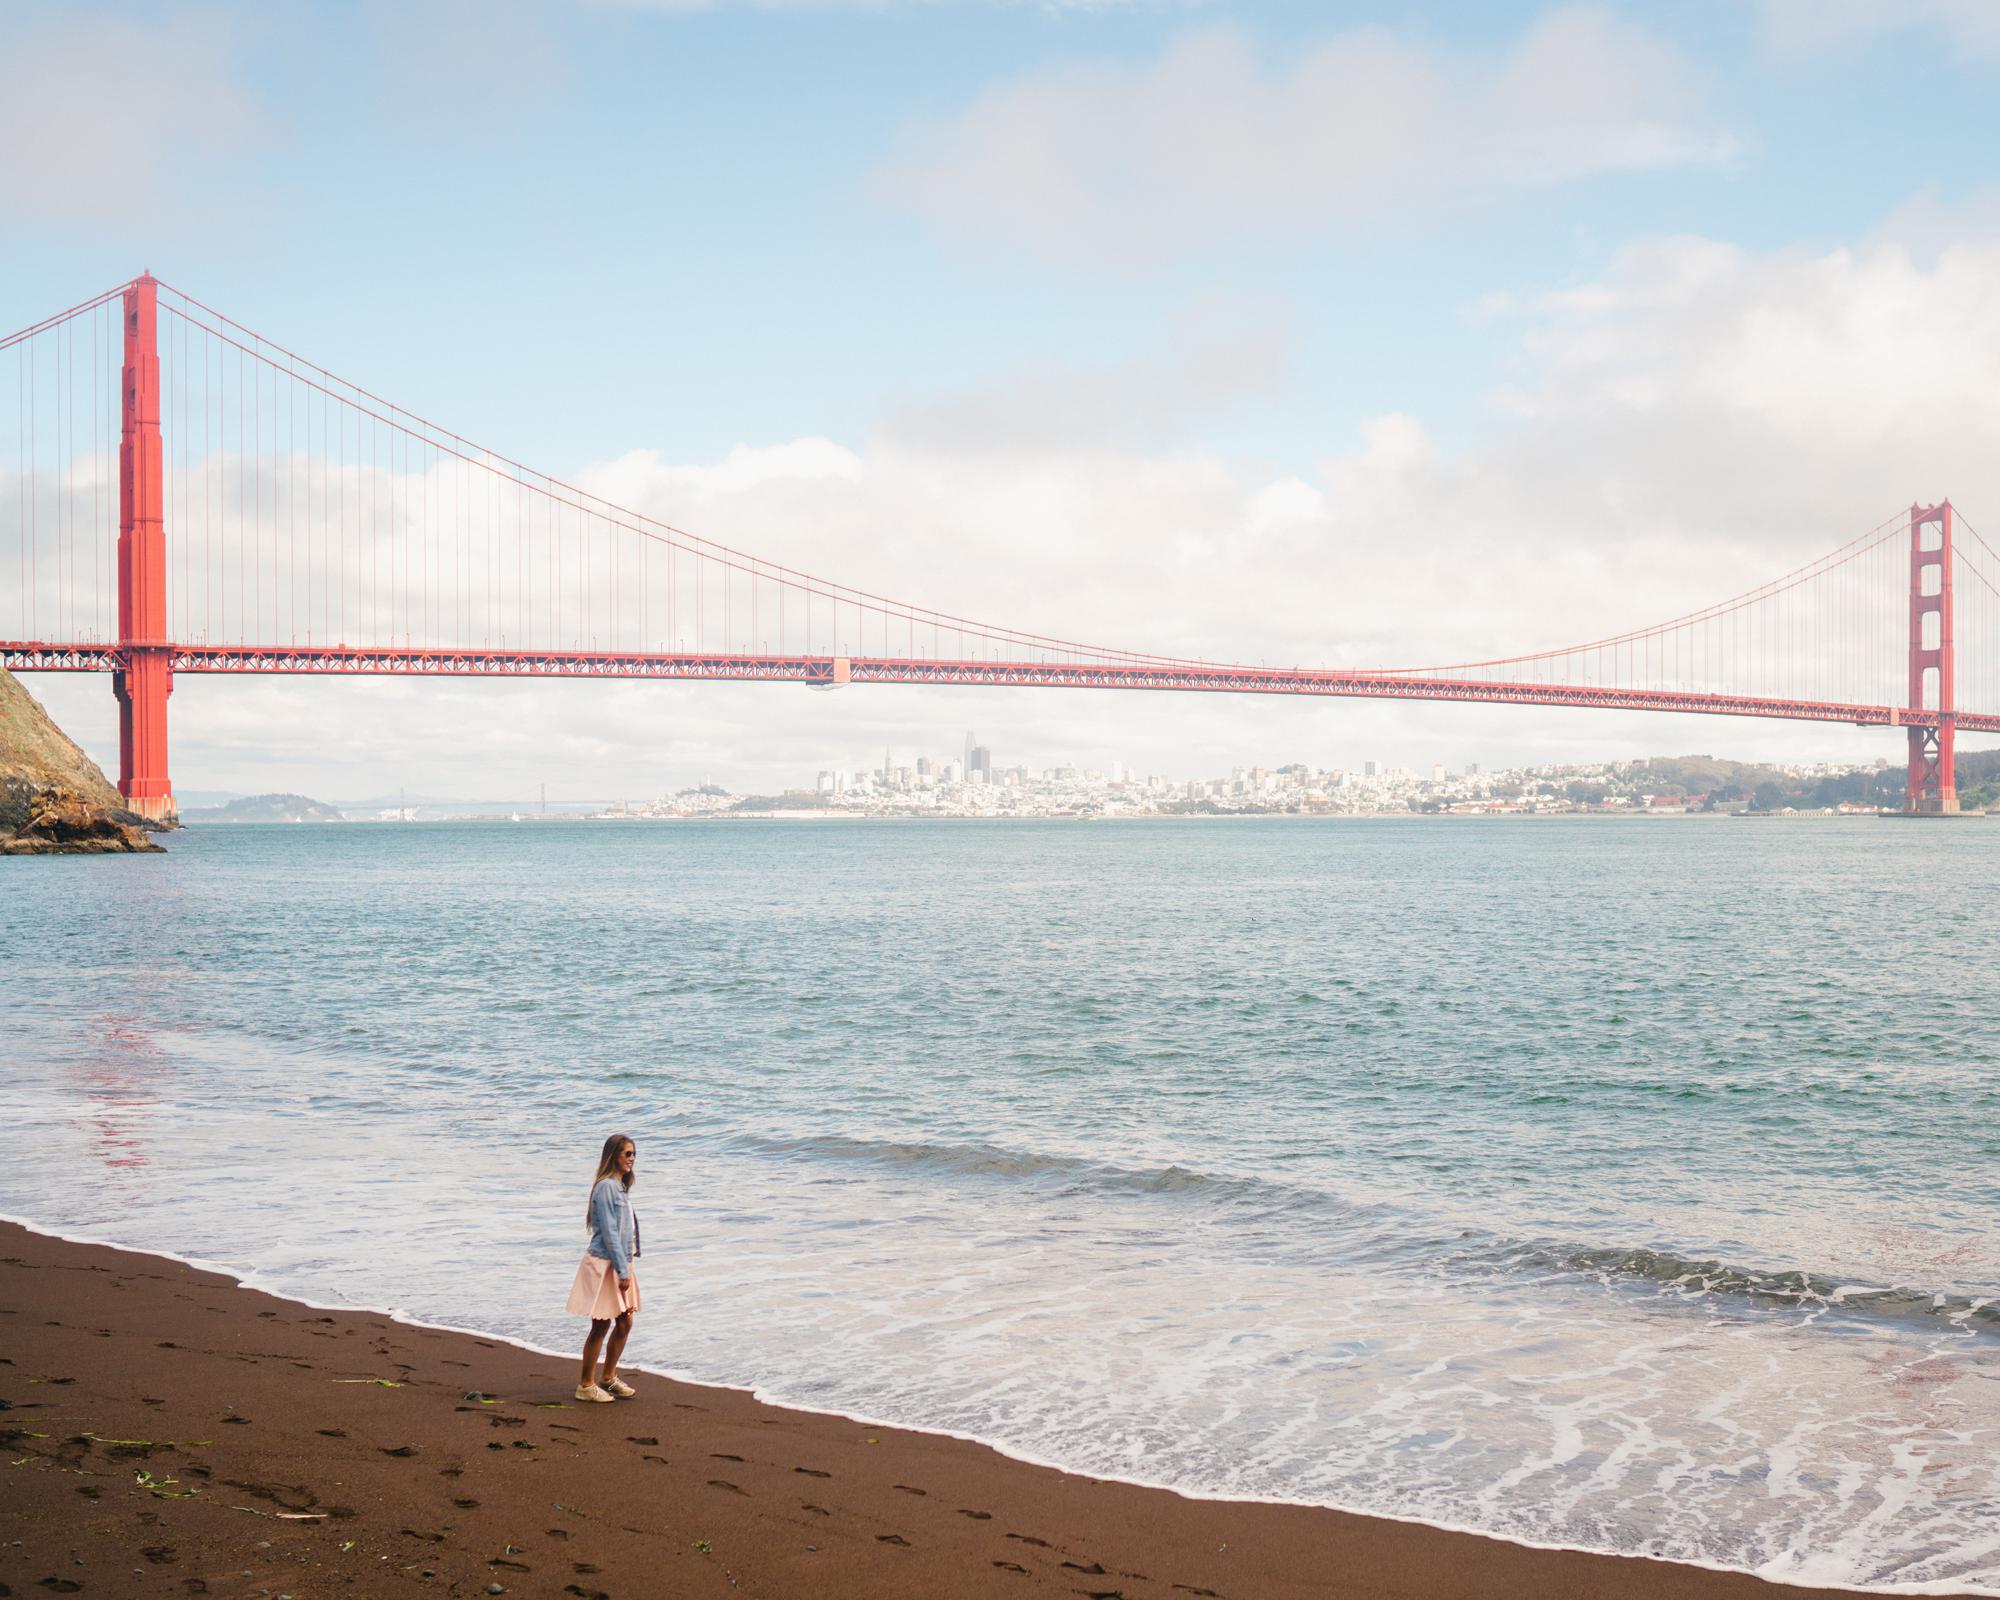 San Francisco Photography Guide